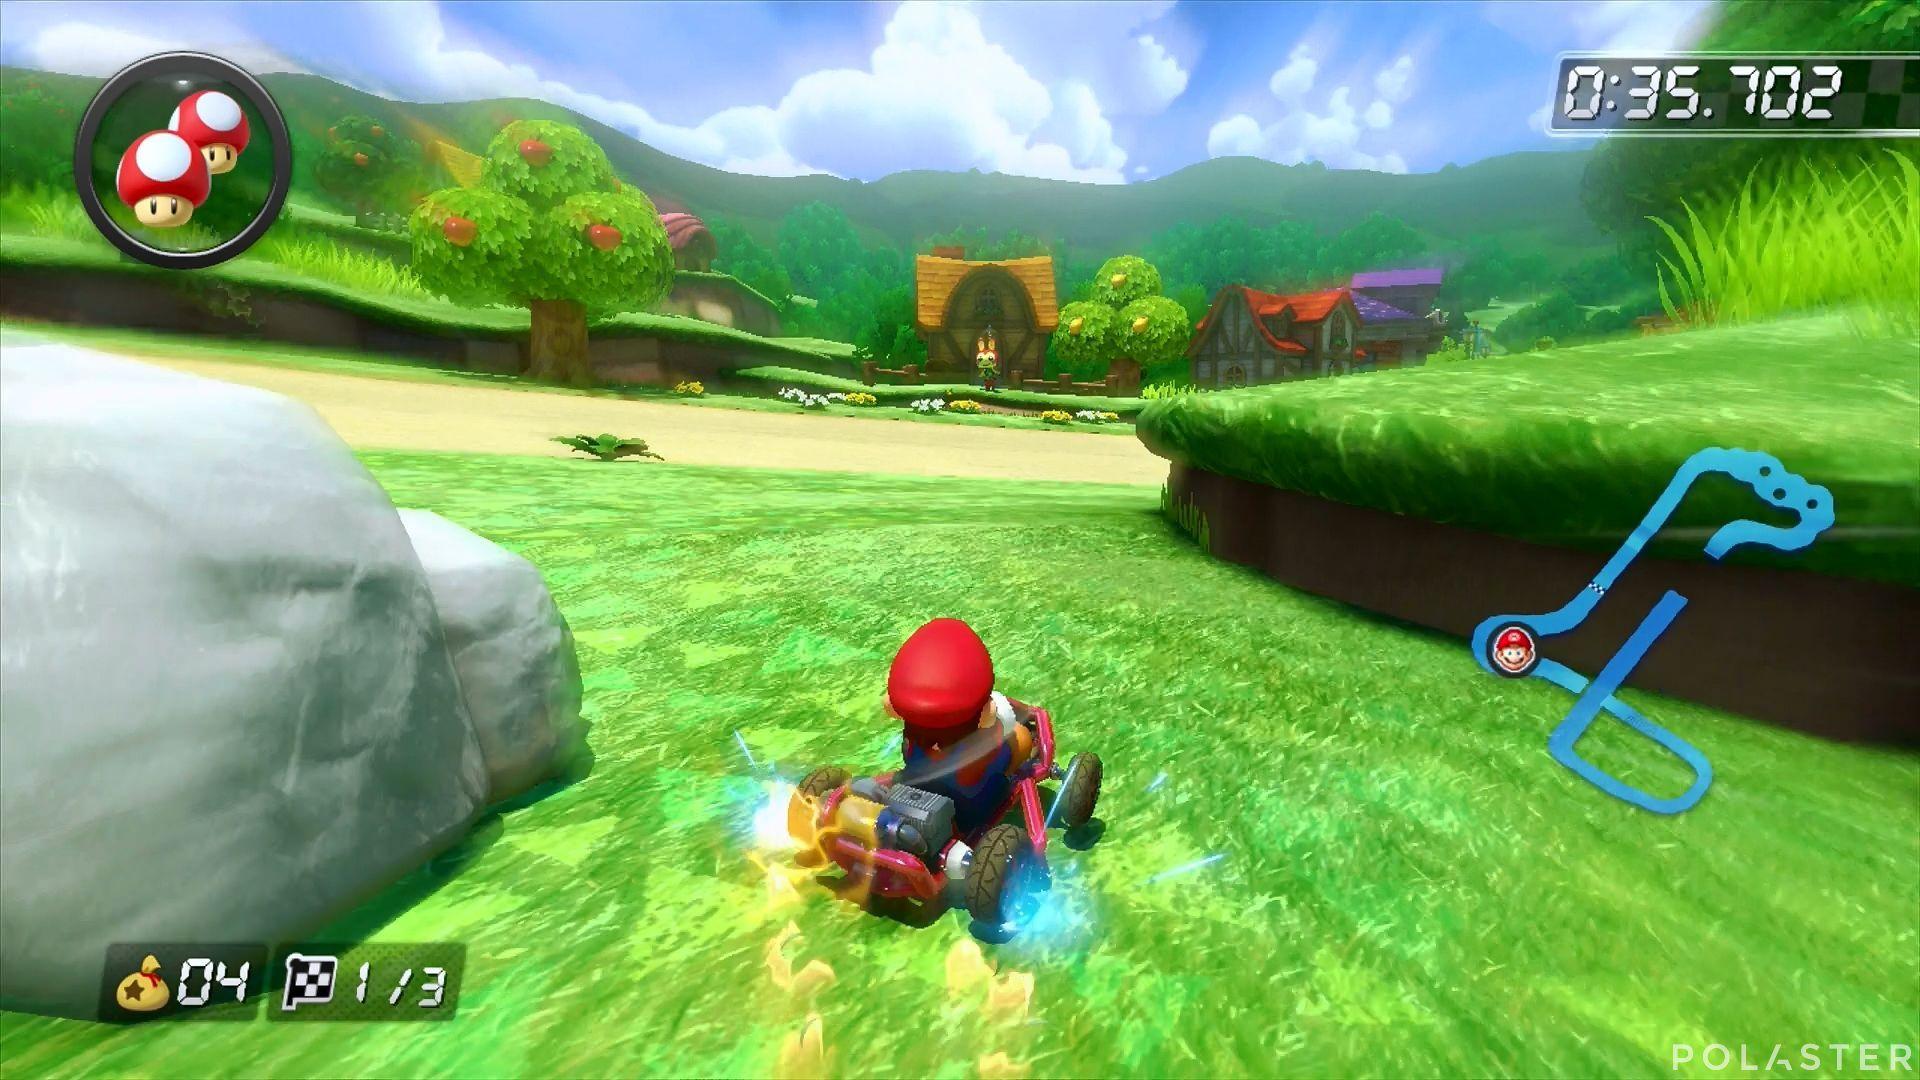 Mario Kart 8 - Animal Crossing